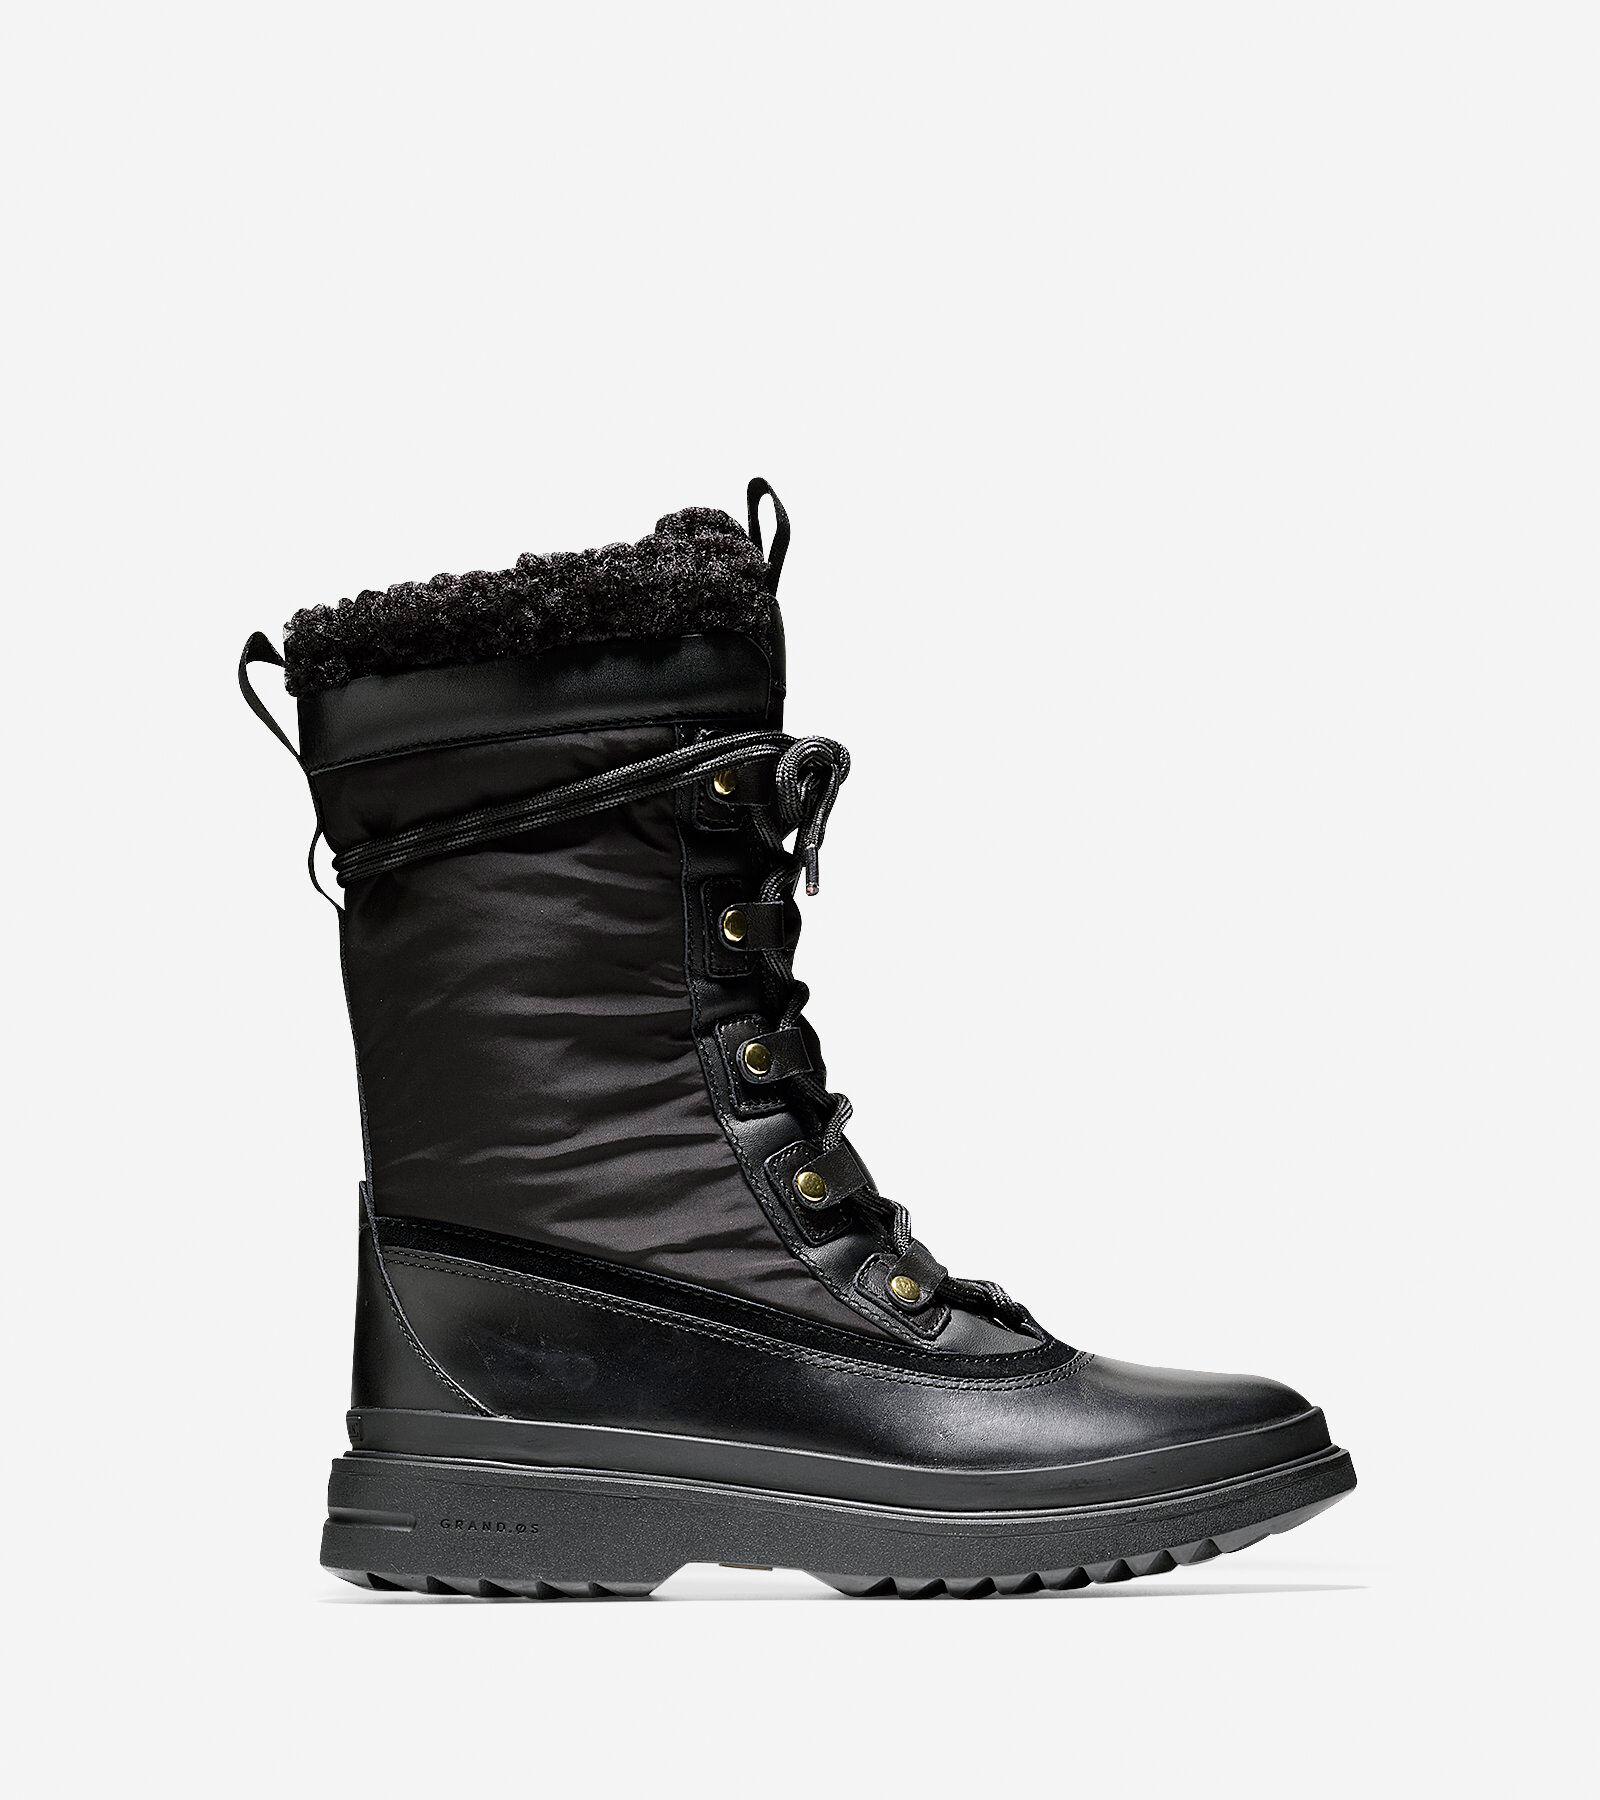 Millbridge Lace-Up Boot Waterproof Cole Haan uT3yUcw56Z